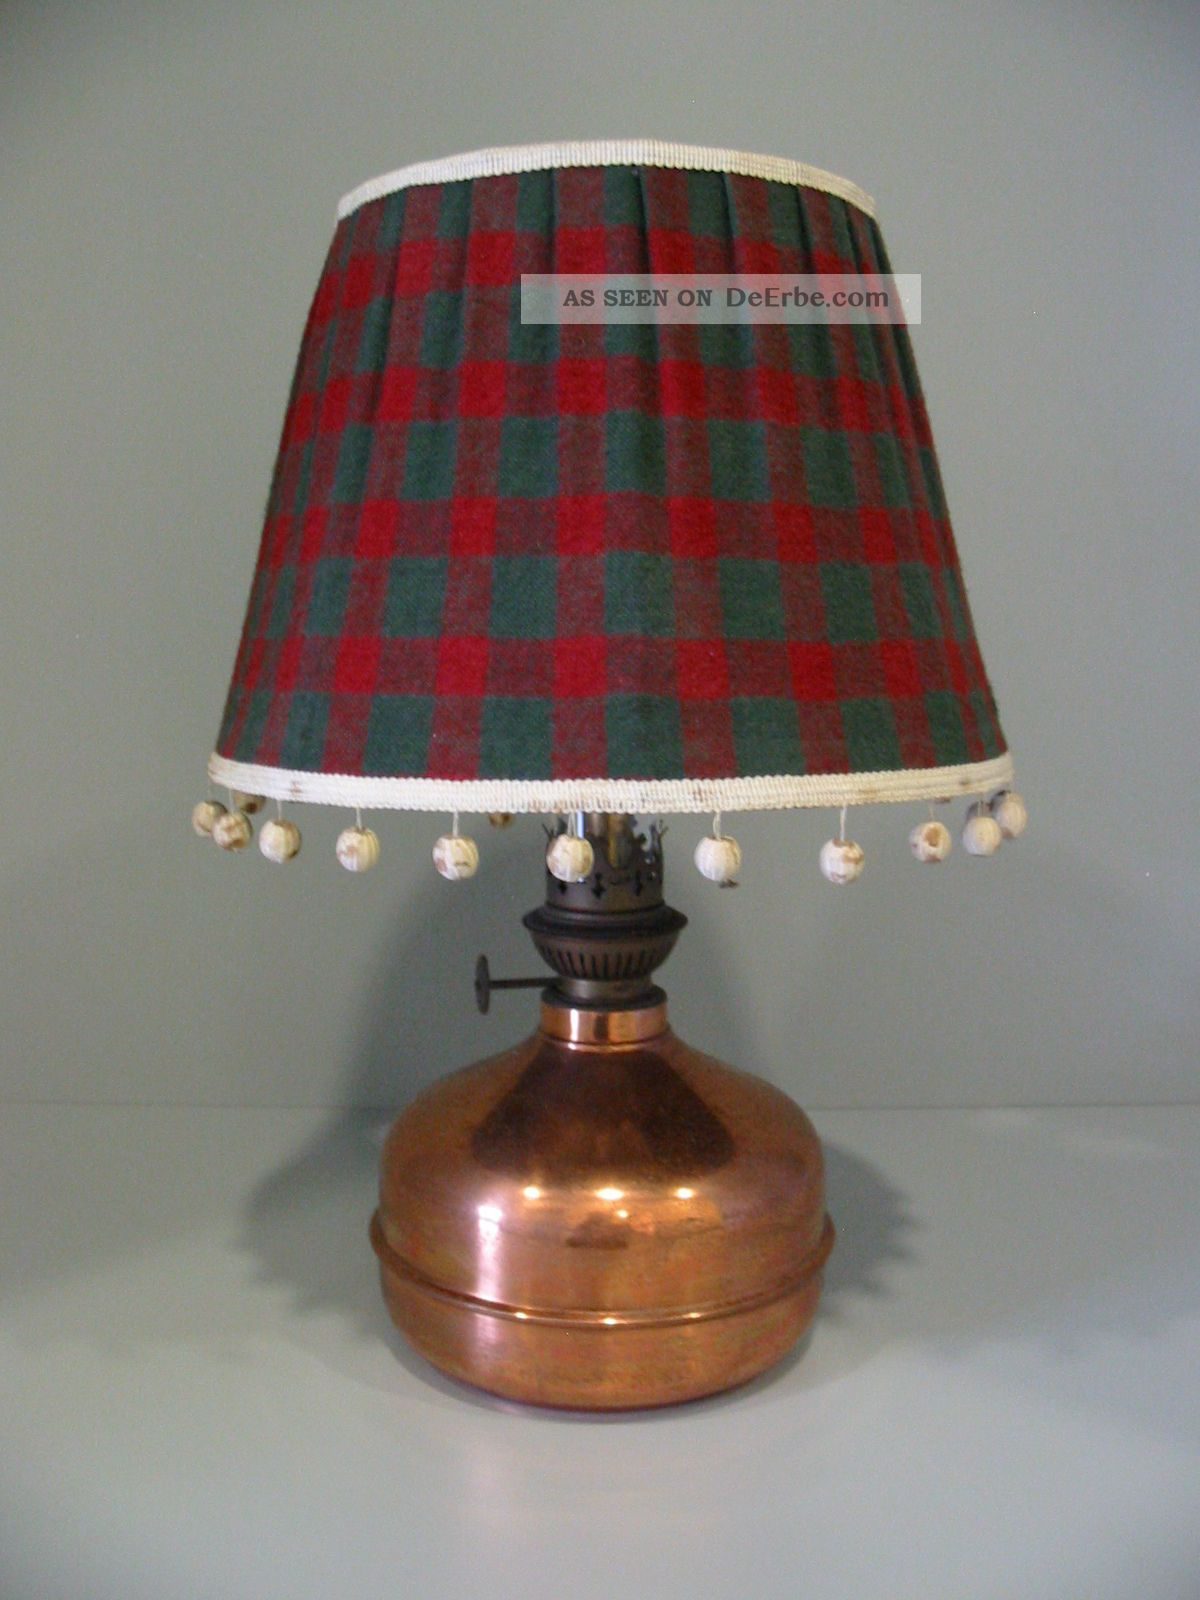 tischlampe petroleumlampe aus den 60 70er jahren. Black Bedroom Furniture Sets. Home Design Ideas